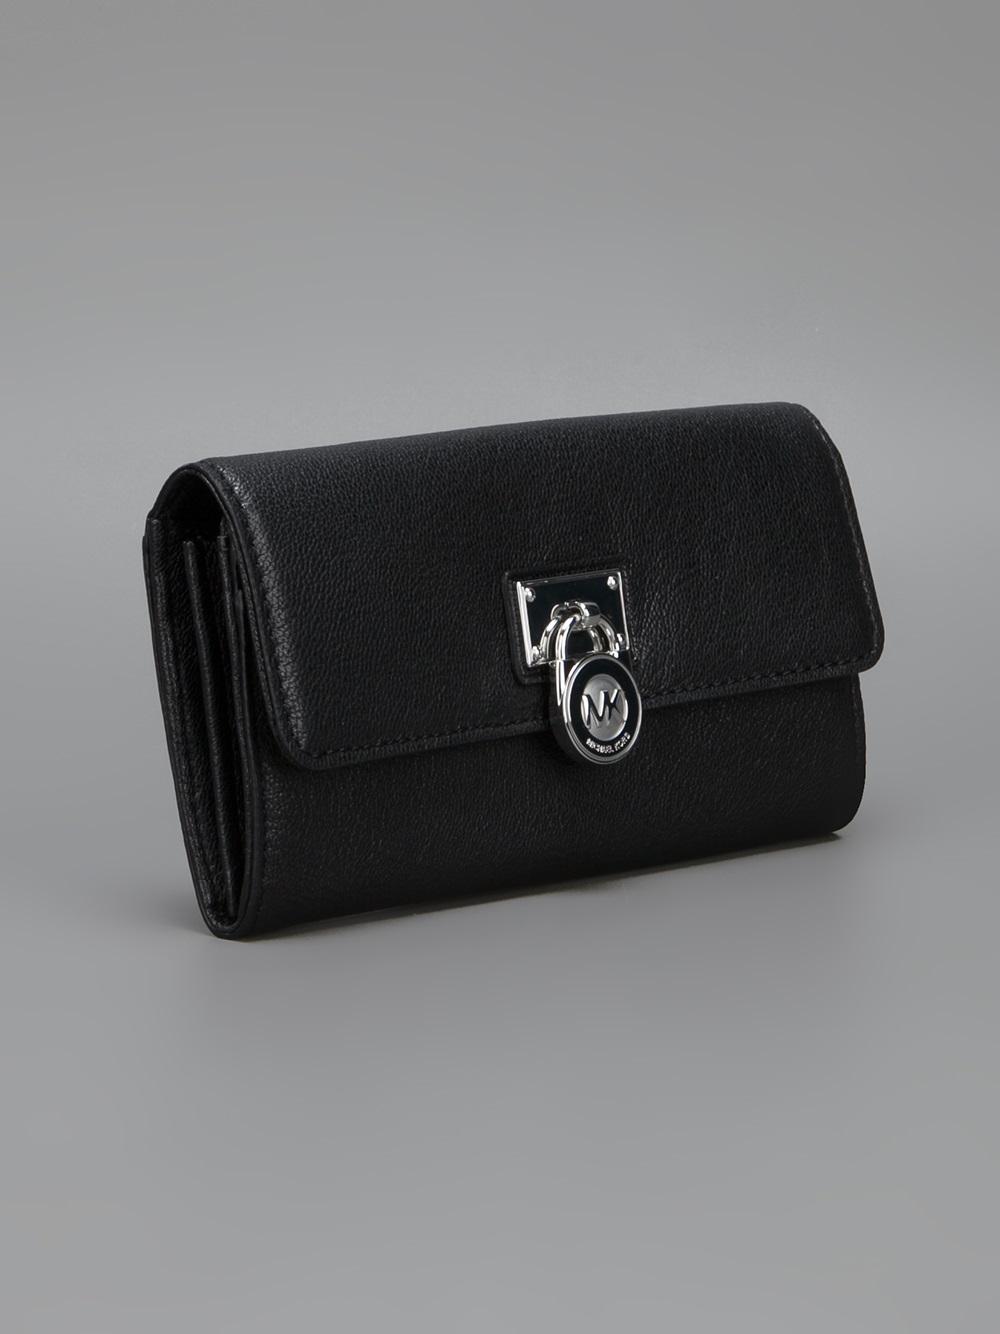 ac09b1f600180a michael kors hamilton large flap wallet sneakers girls - Marwood ...